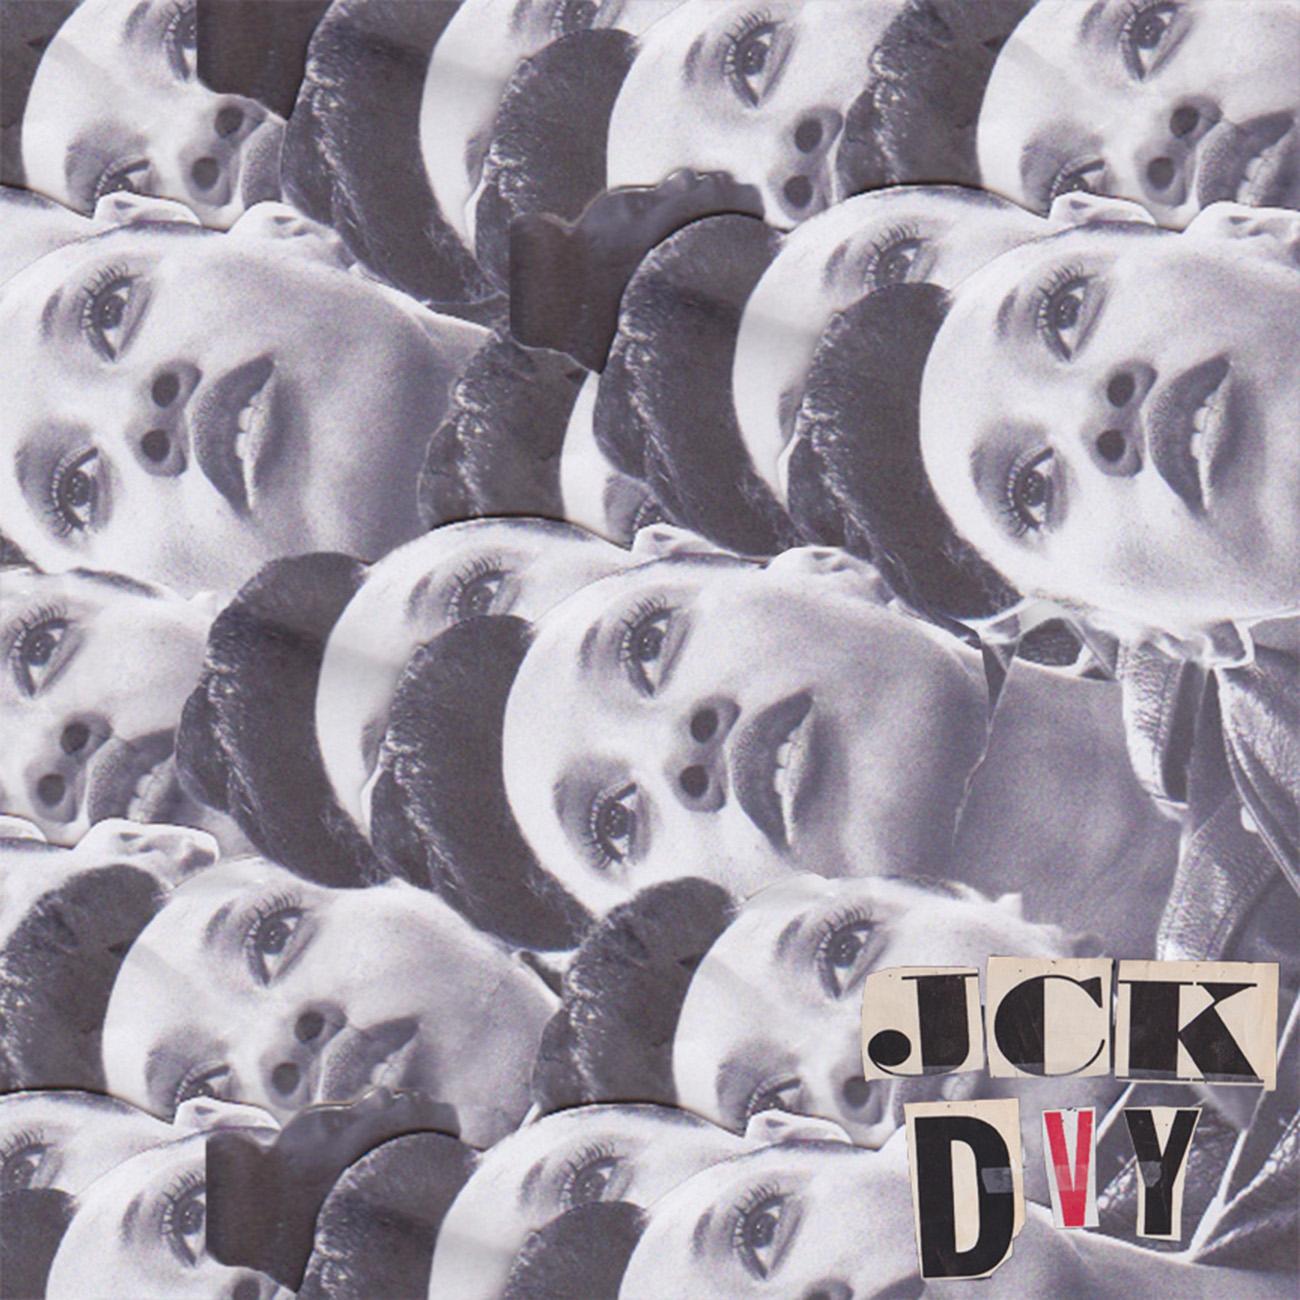 JCK DVY Presents LO-F!